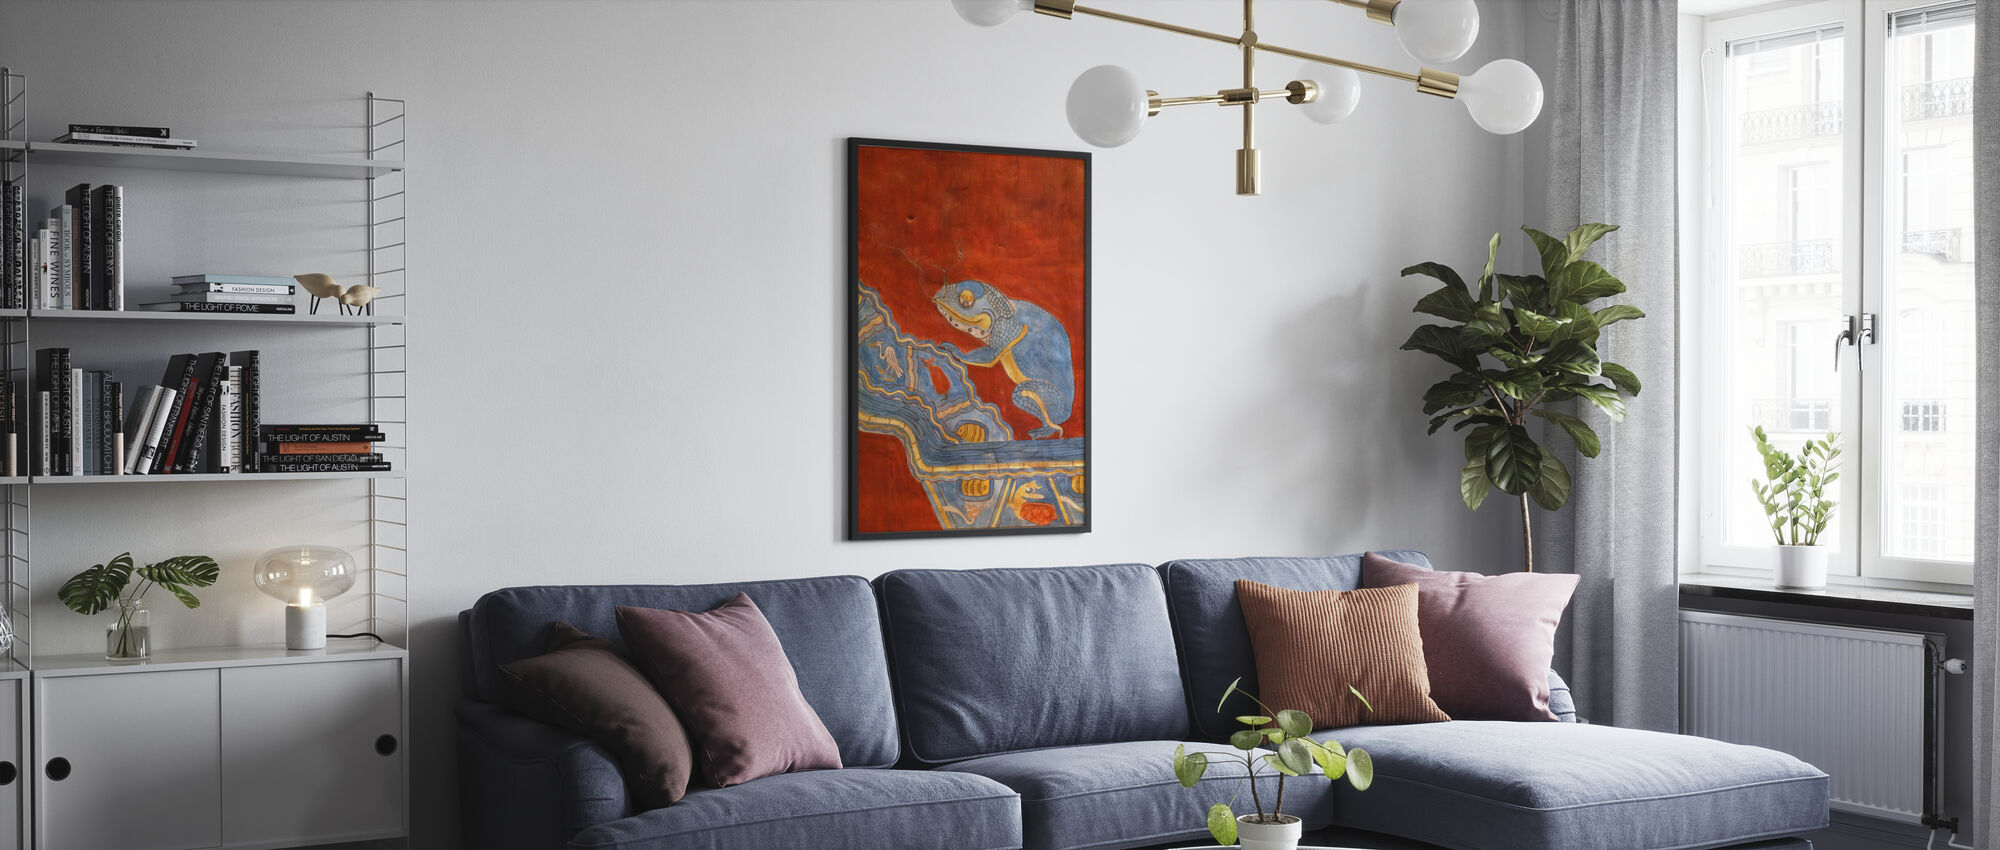 Mornings in Mexico – D HLawrence - Framed print - Living Room